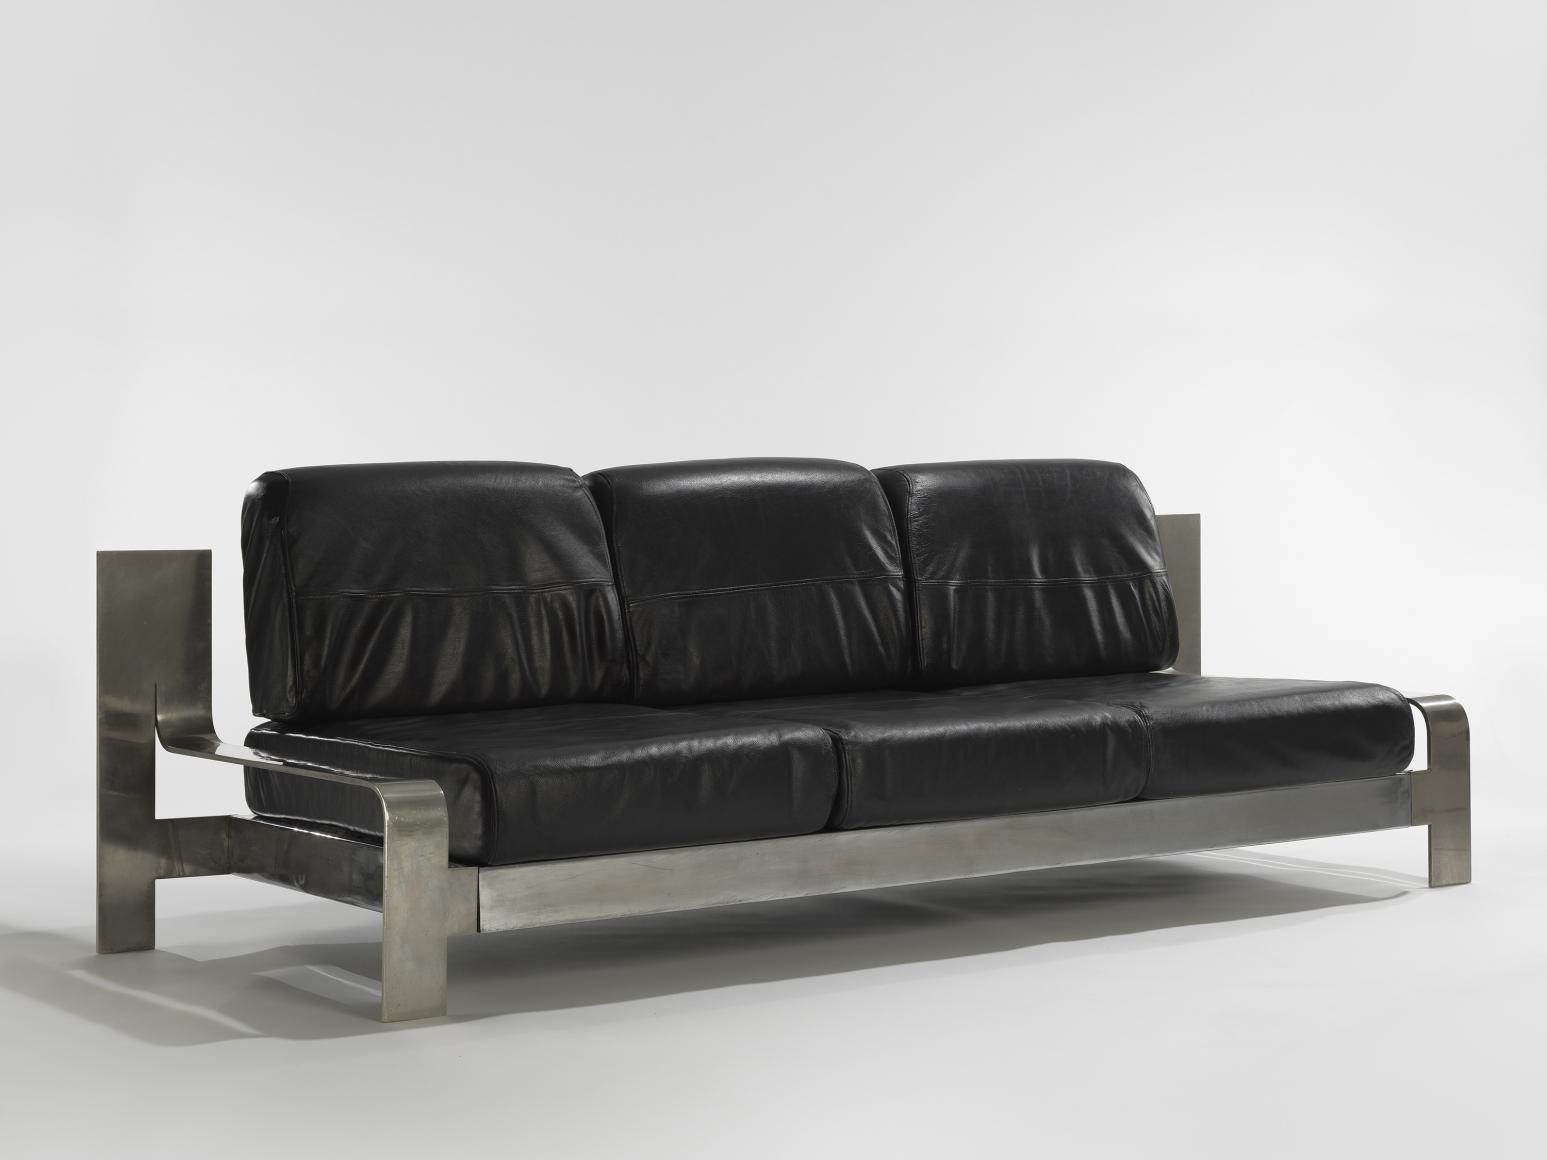 Jean Paul Barray. Sofa